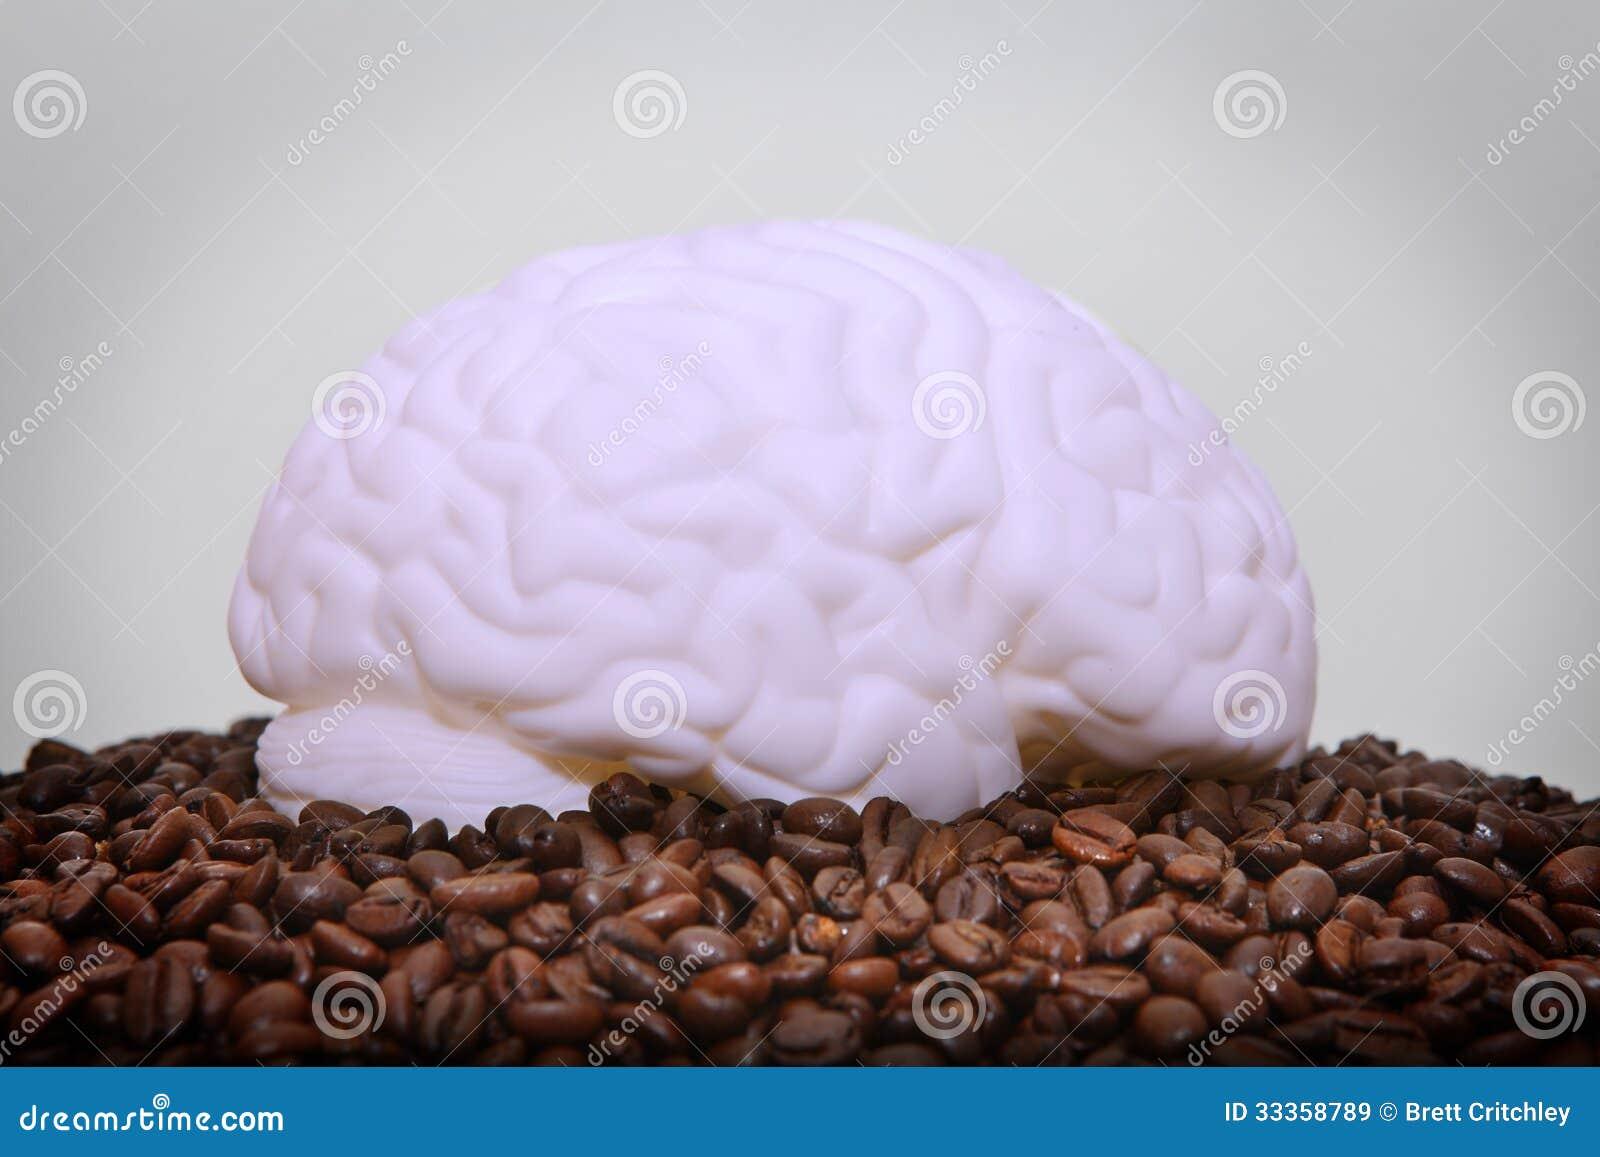 Human brain caffeine addiction